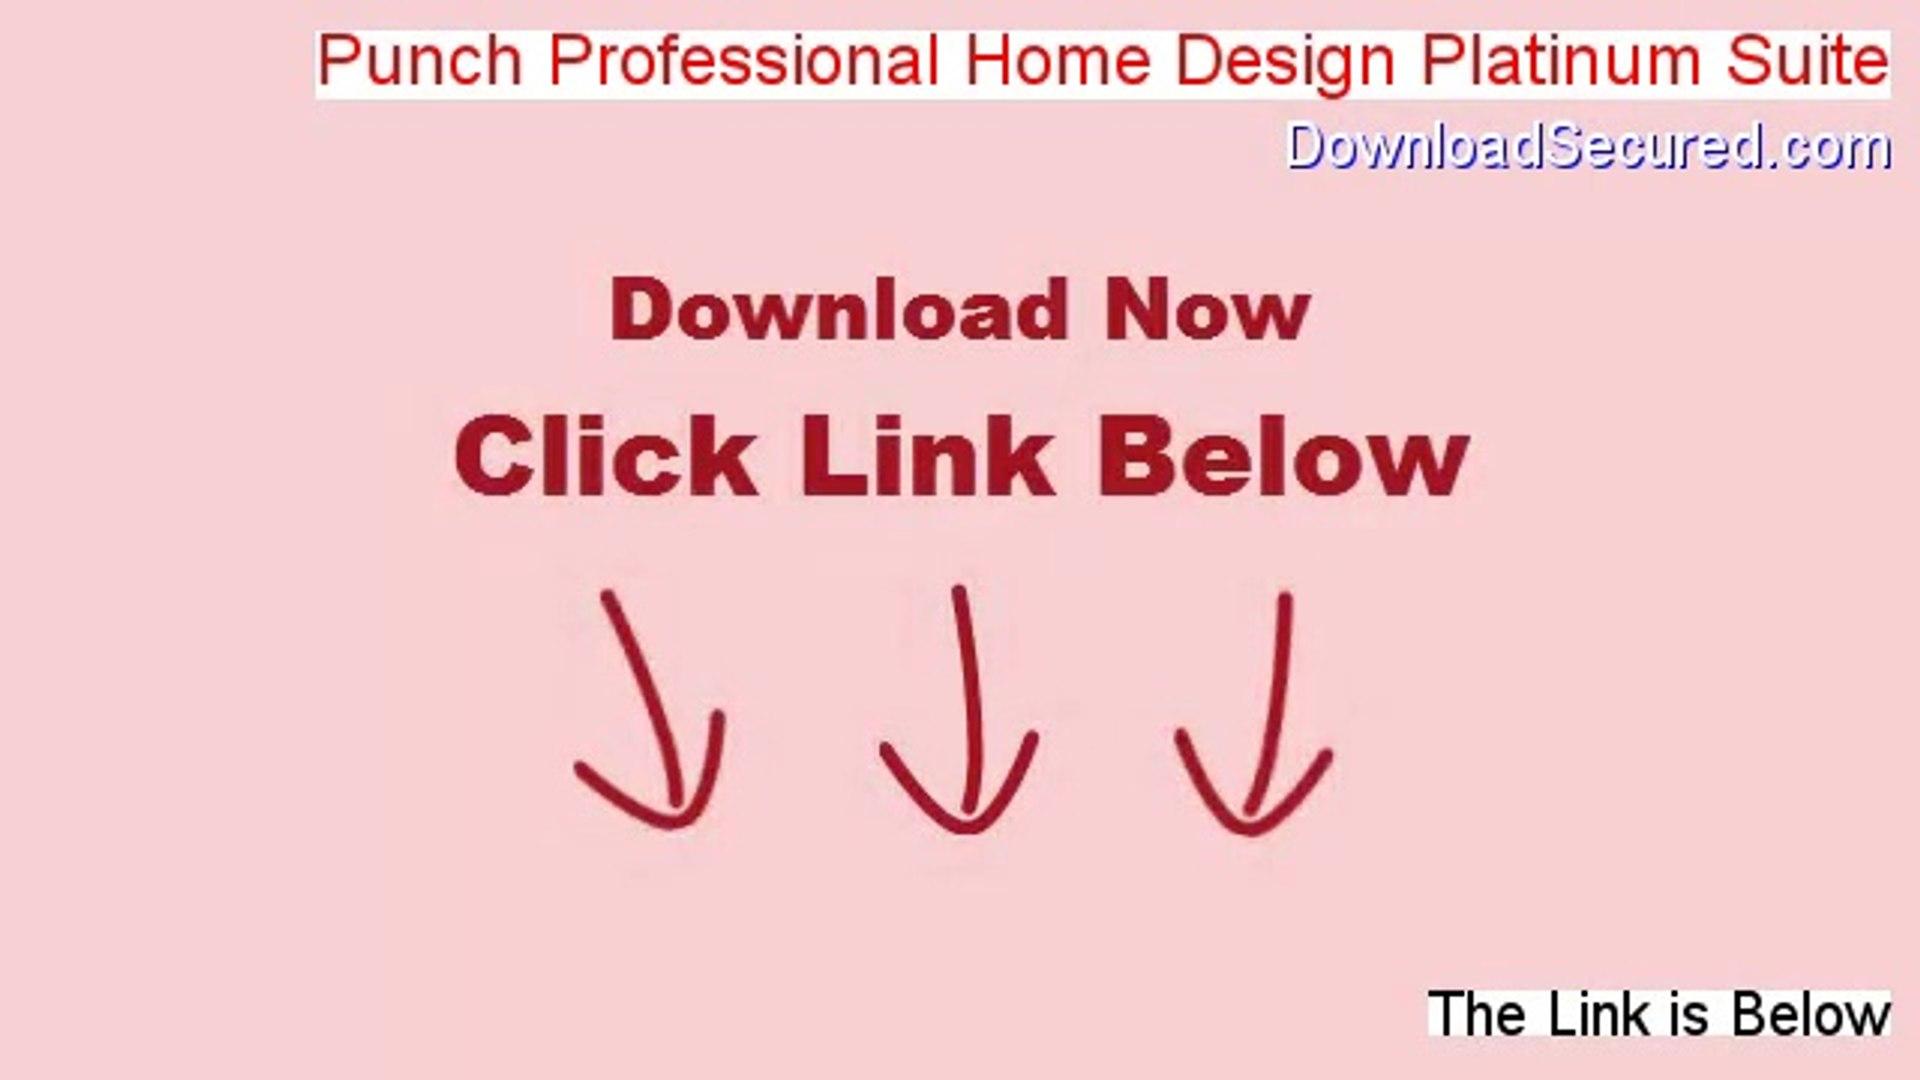 Punch Professional Home Design Platinum Suite Free Download Punch Professional Home Design Platinum Suite 2014 Video Dailymotion